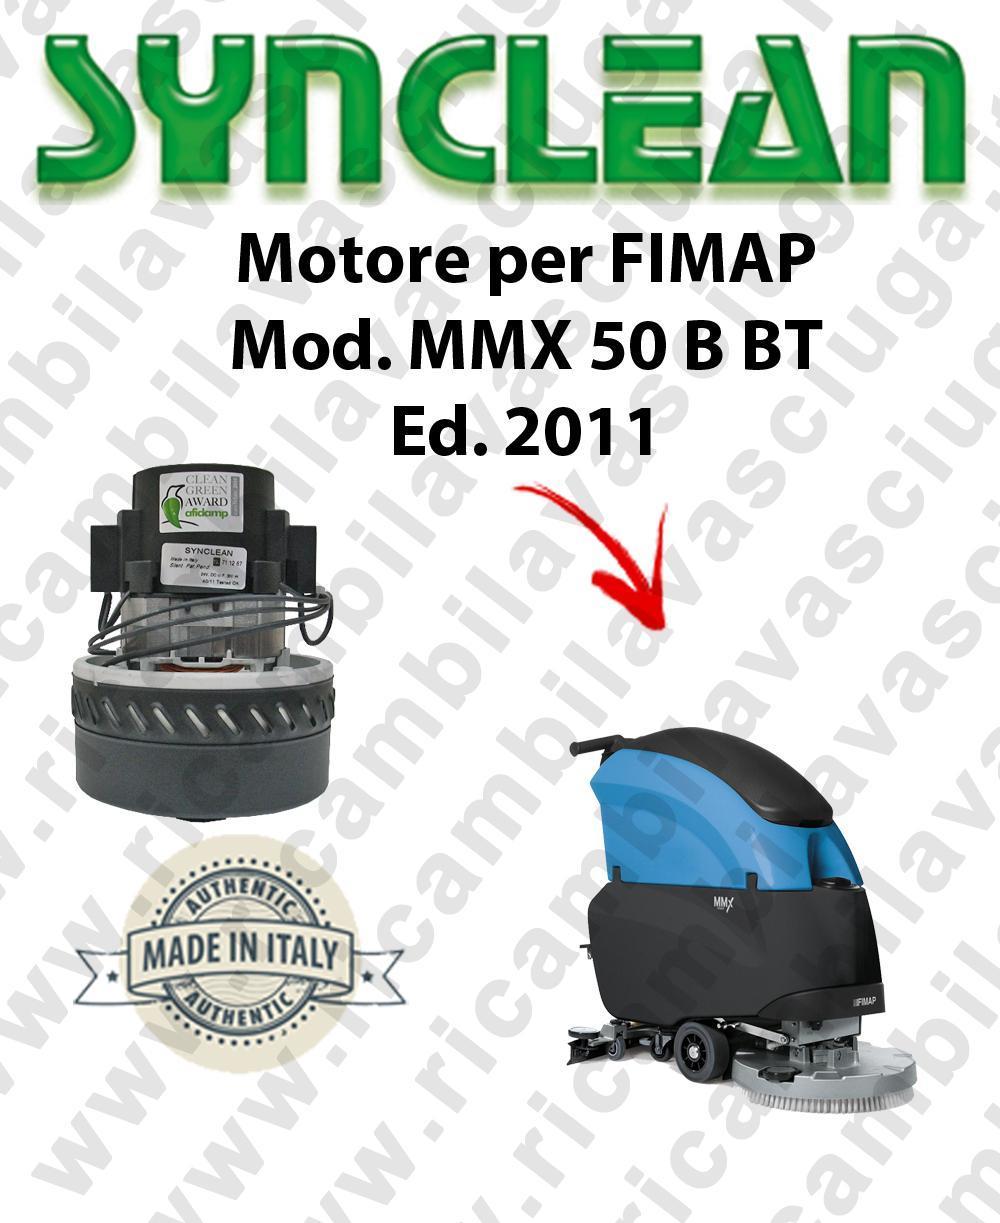 Fimap MMX 50 B-BT Ed. 2011 MOTORE aspirazione SYNCLEAN lavapavimenti